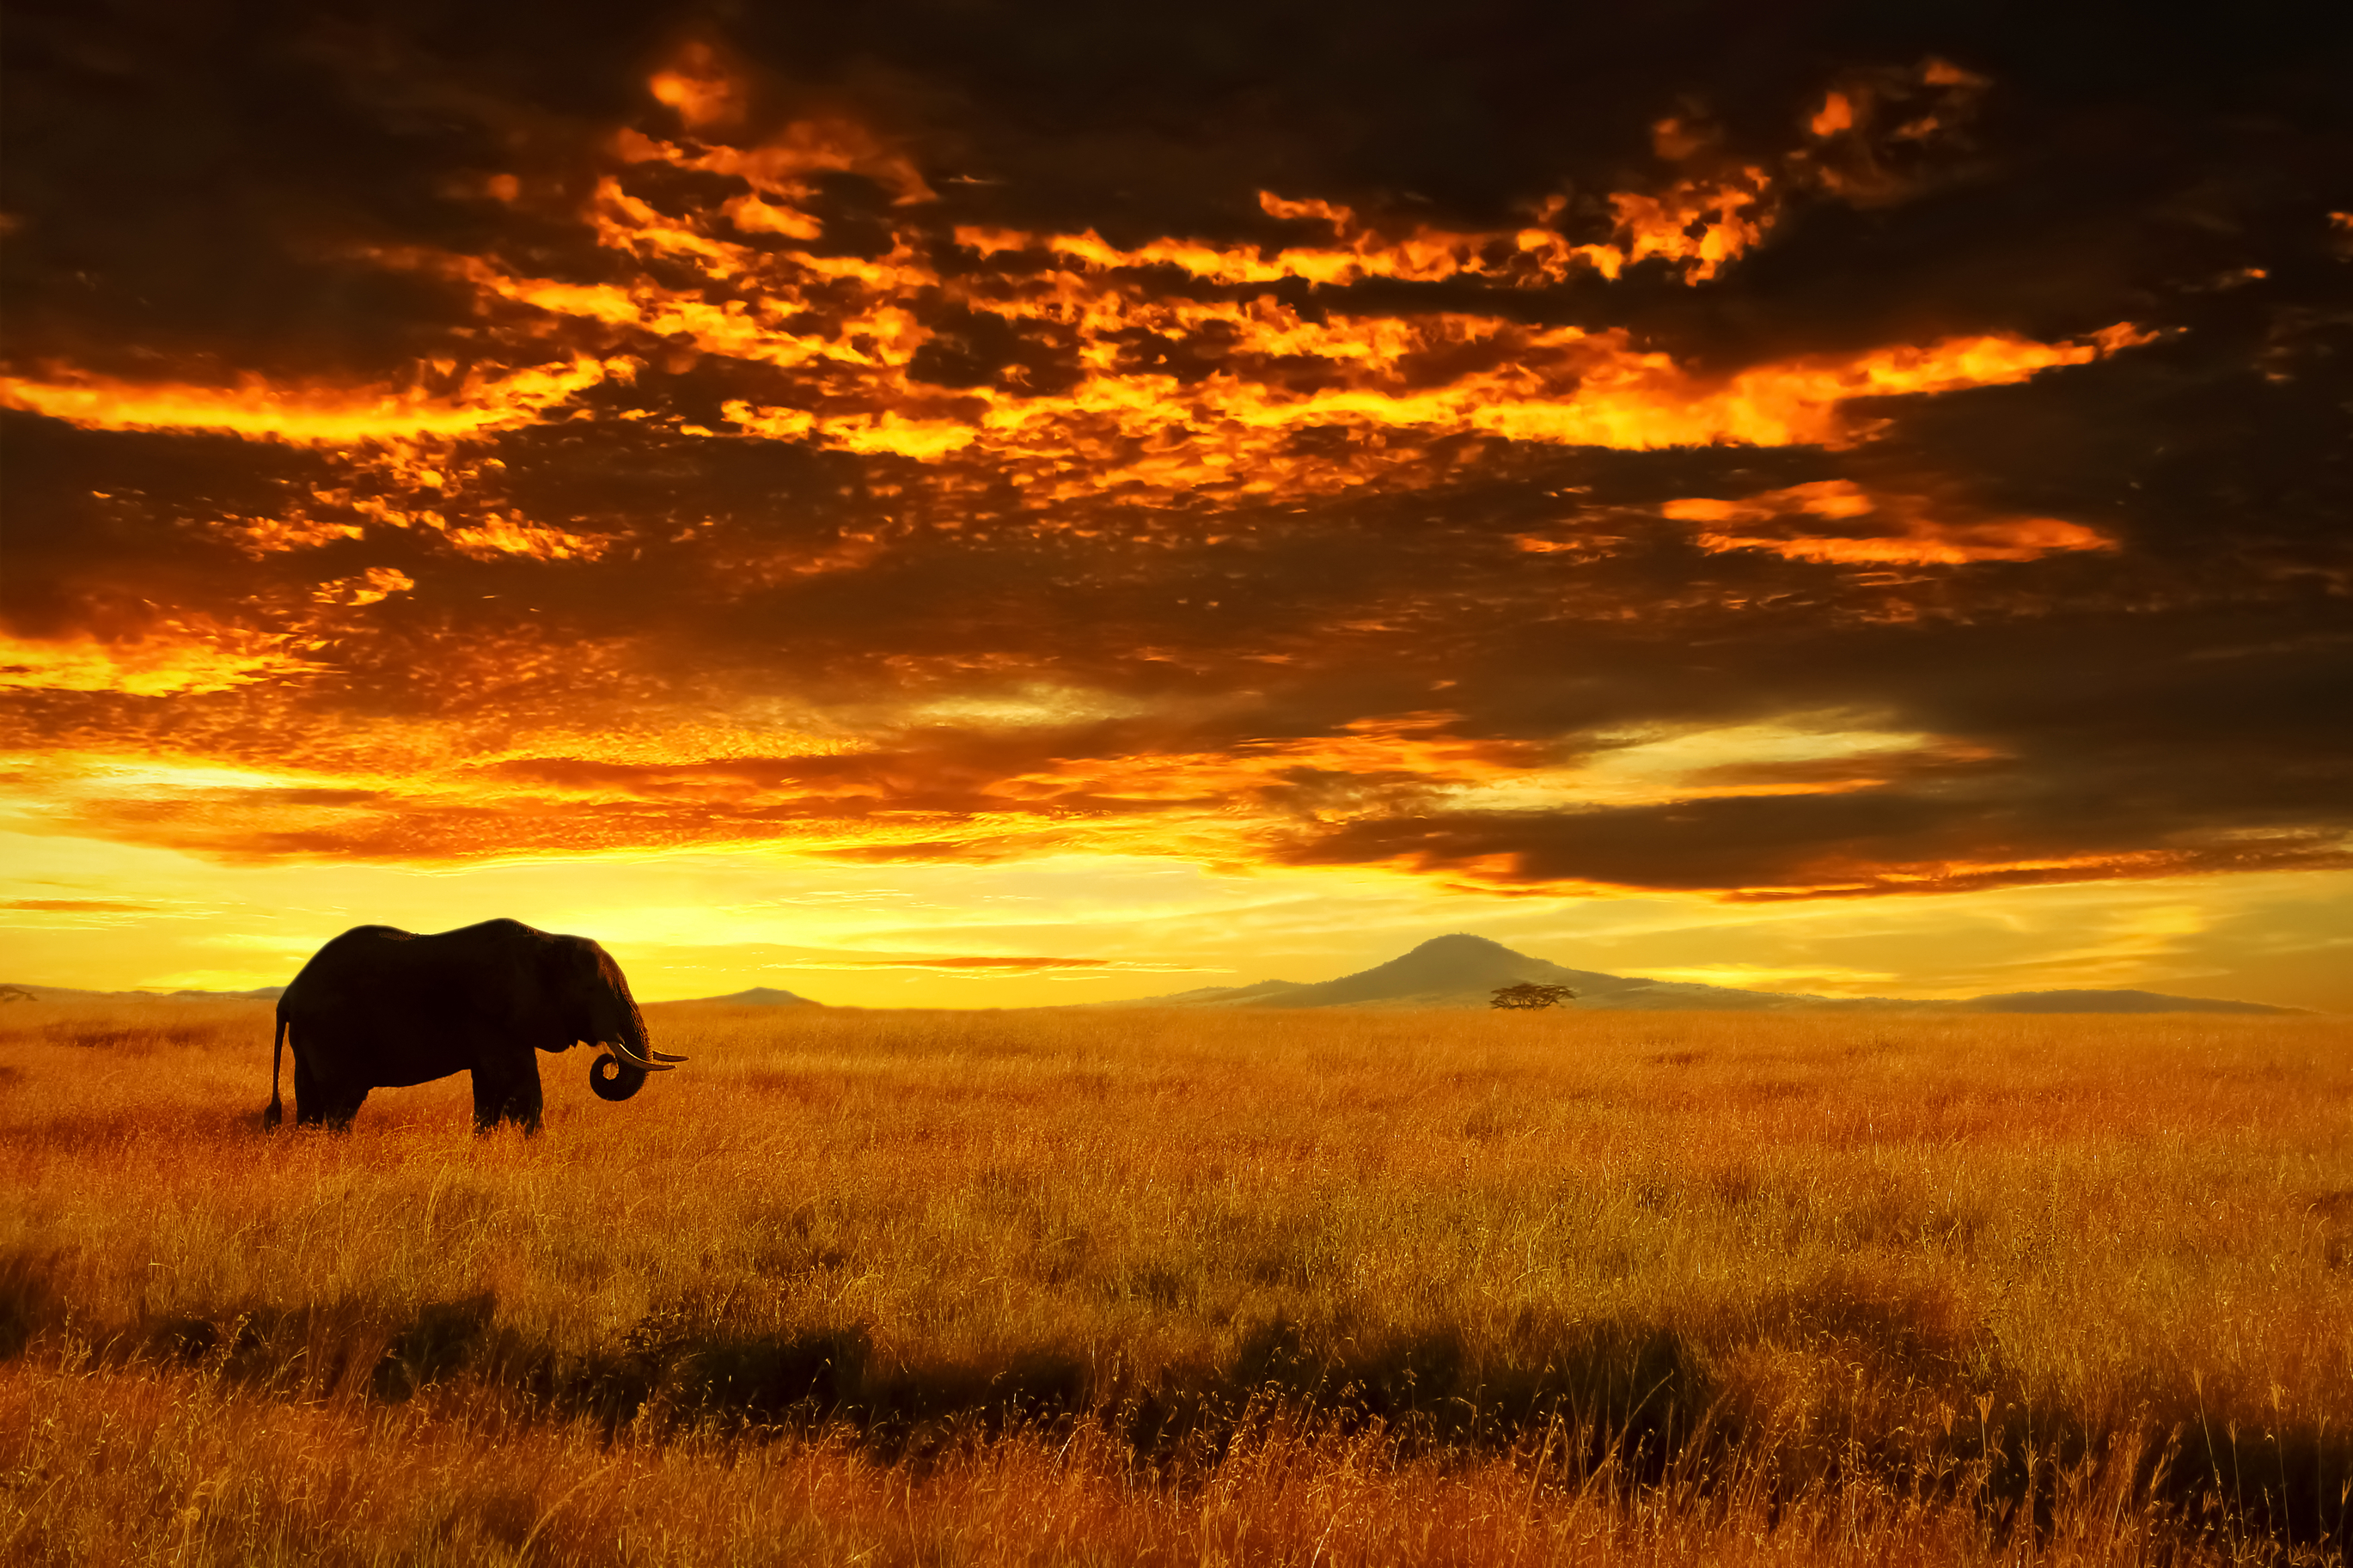 An elephant on a sunset stroll in Serengeti National Park